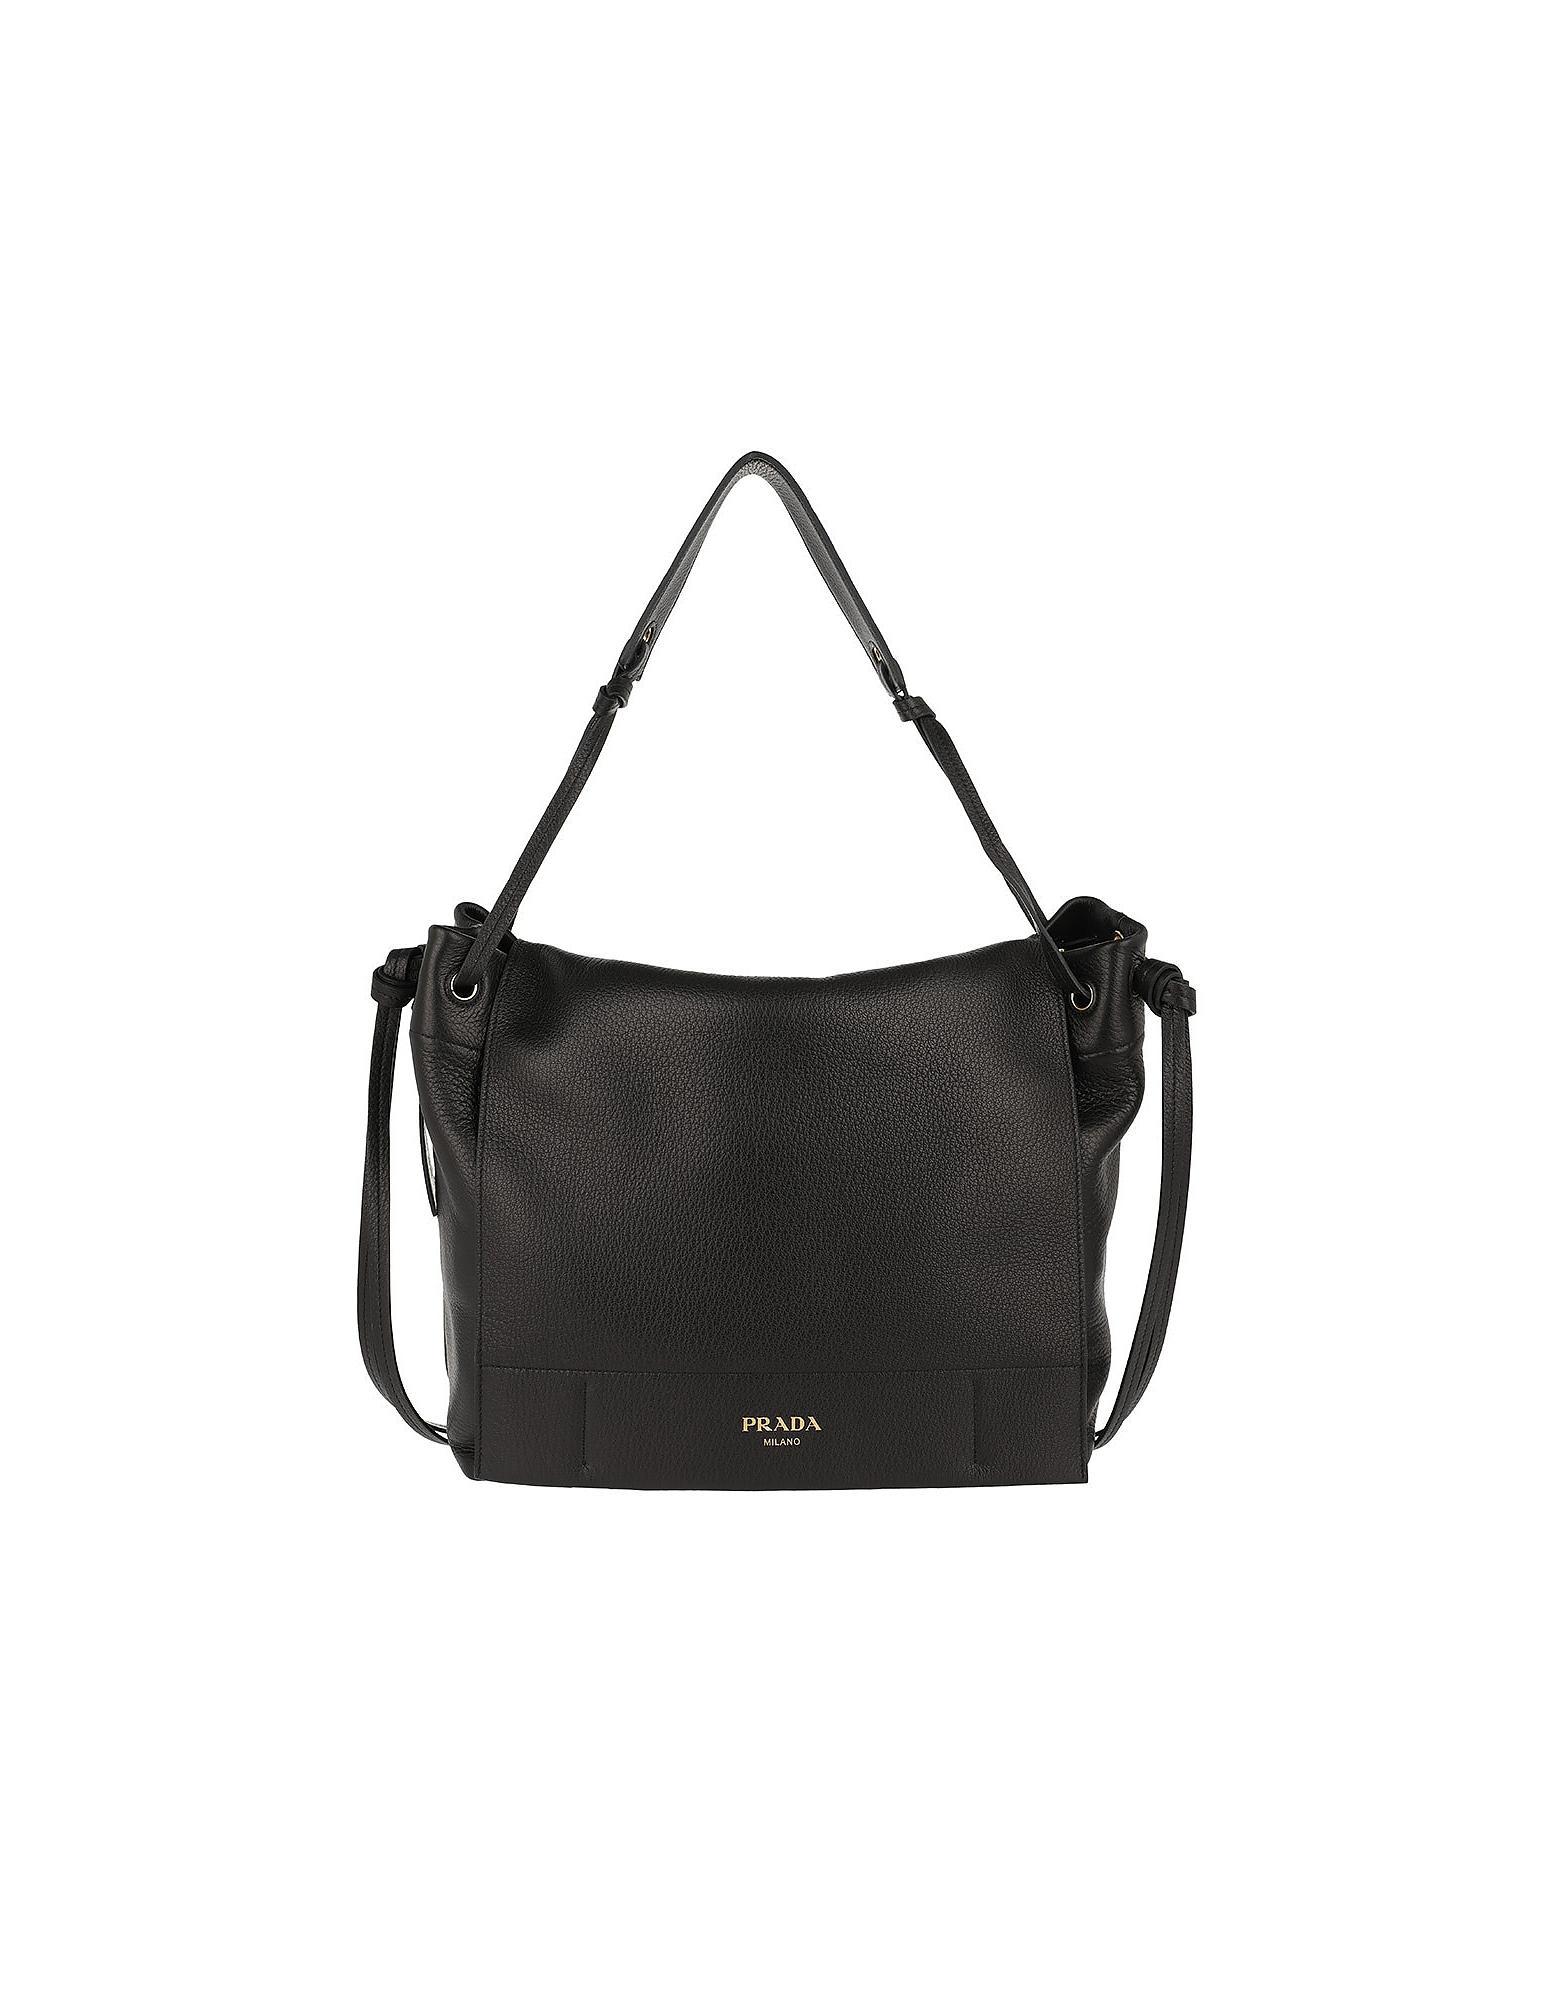 48a87e67a320 Prada Shoulder Bag Grained Leather Nero in Black - Lyst